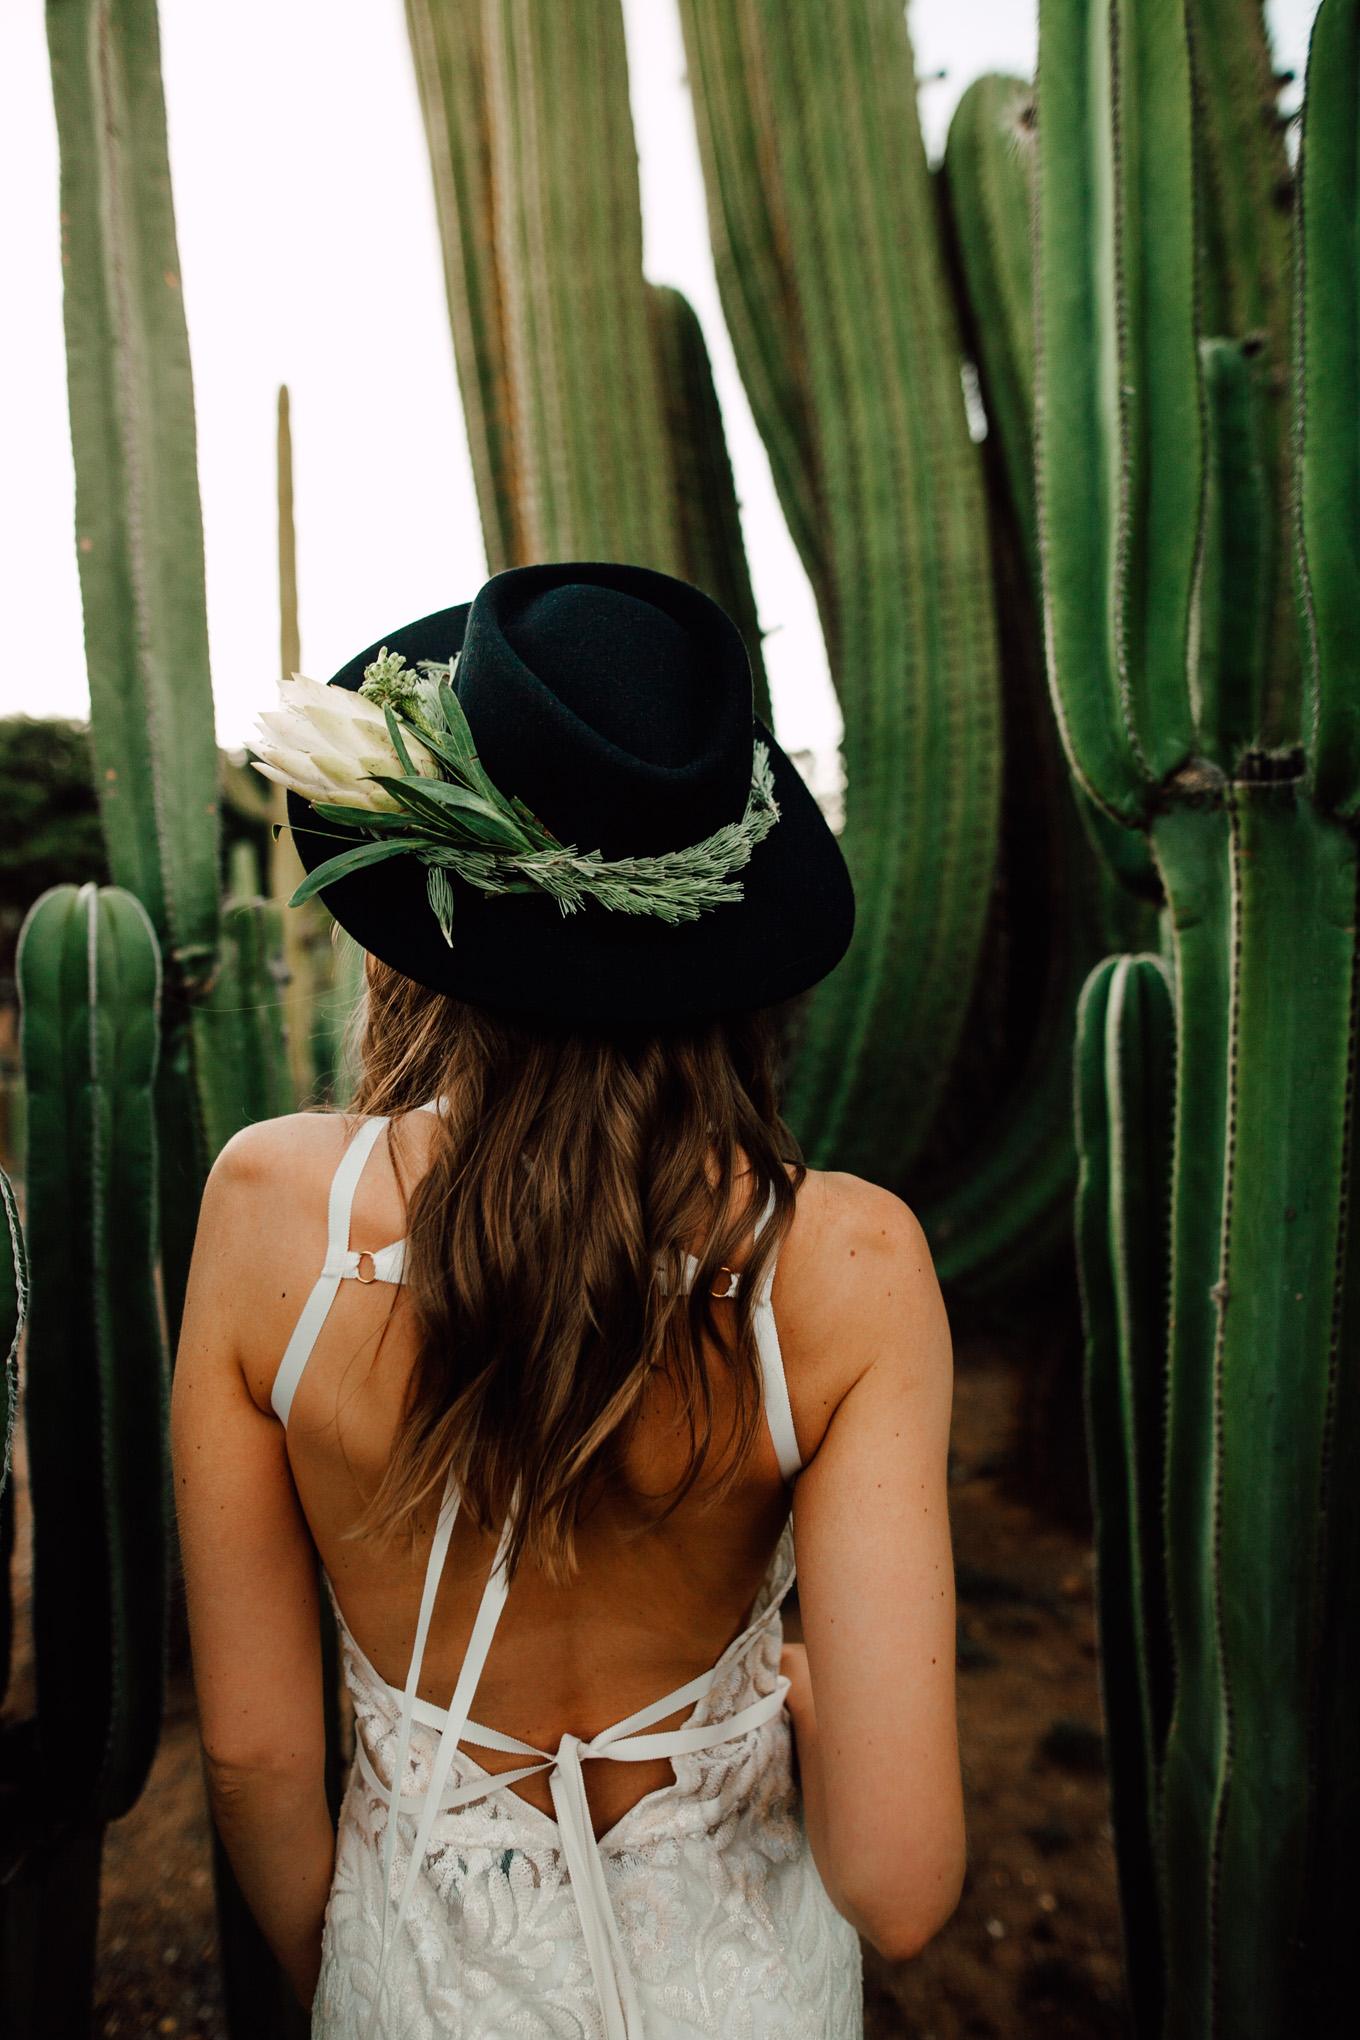 Cape-Town-Pia-Anna-Christian-Wedding-Photography-South-Africa-Bride-Cactus-19.jpg